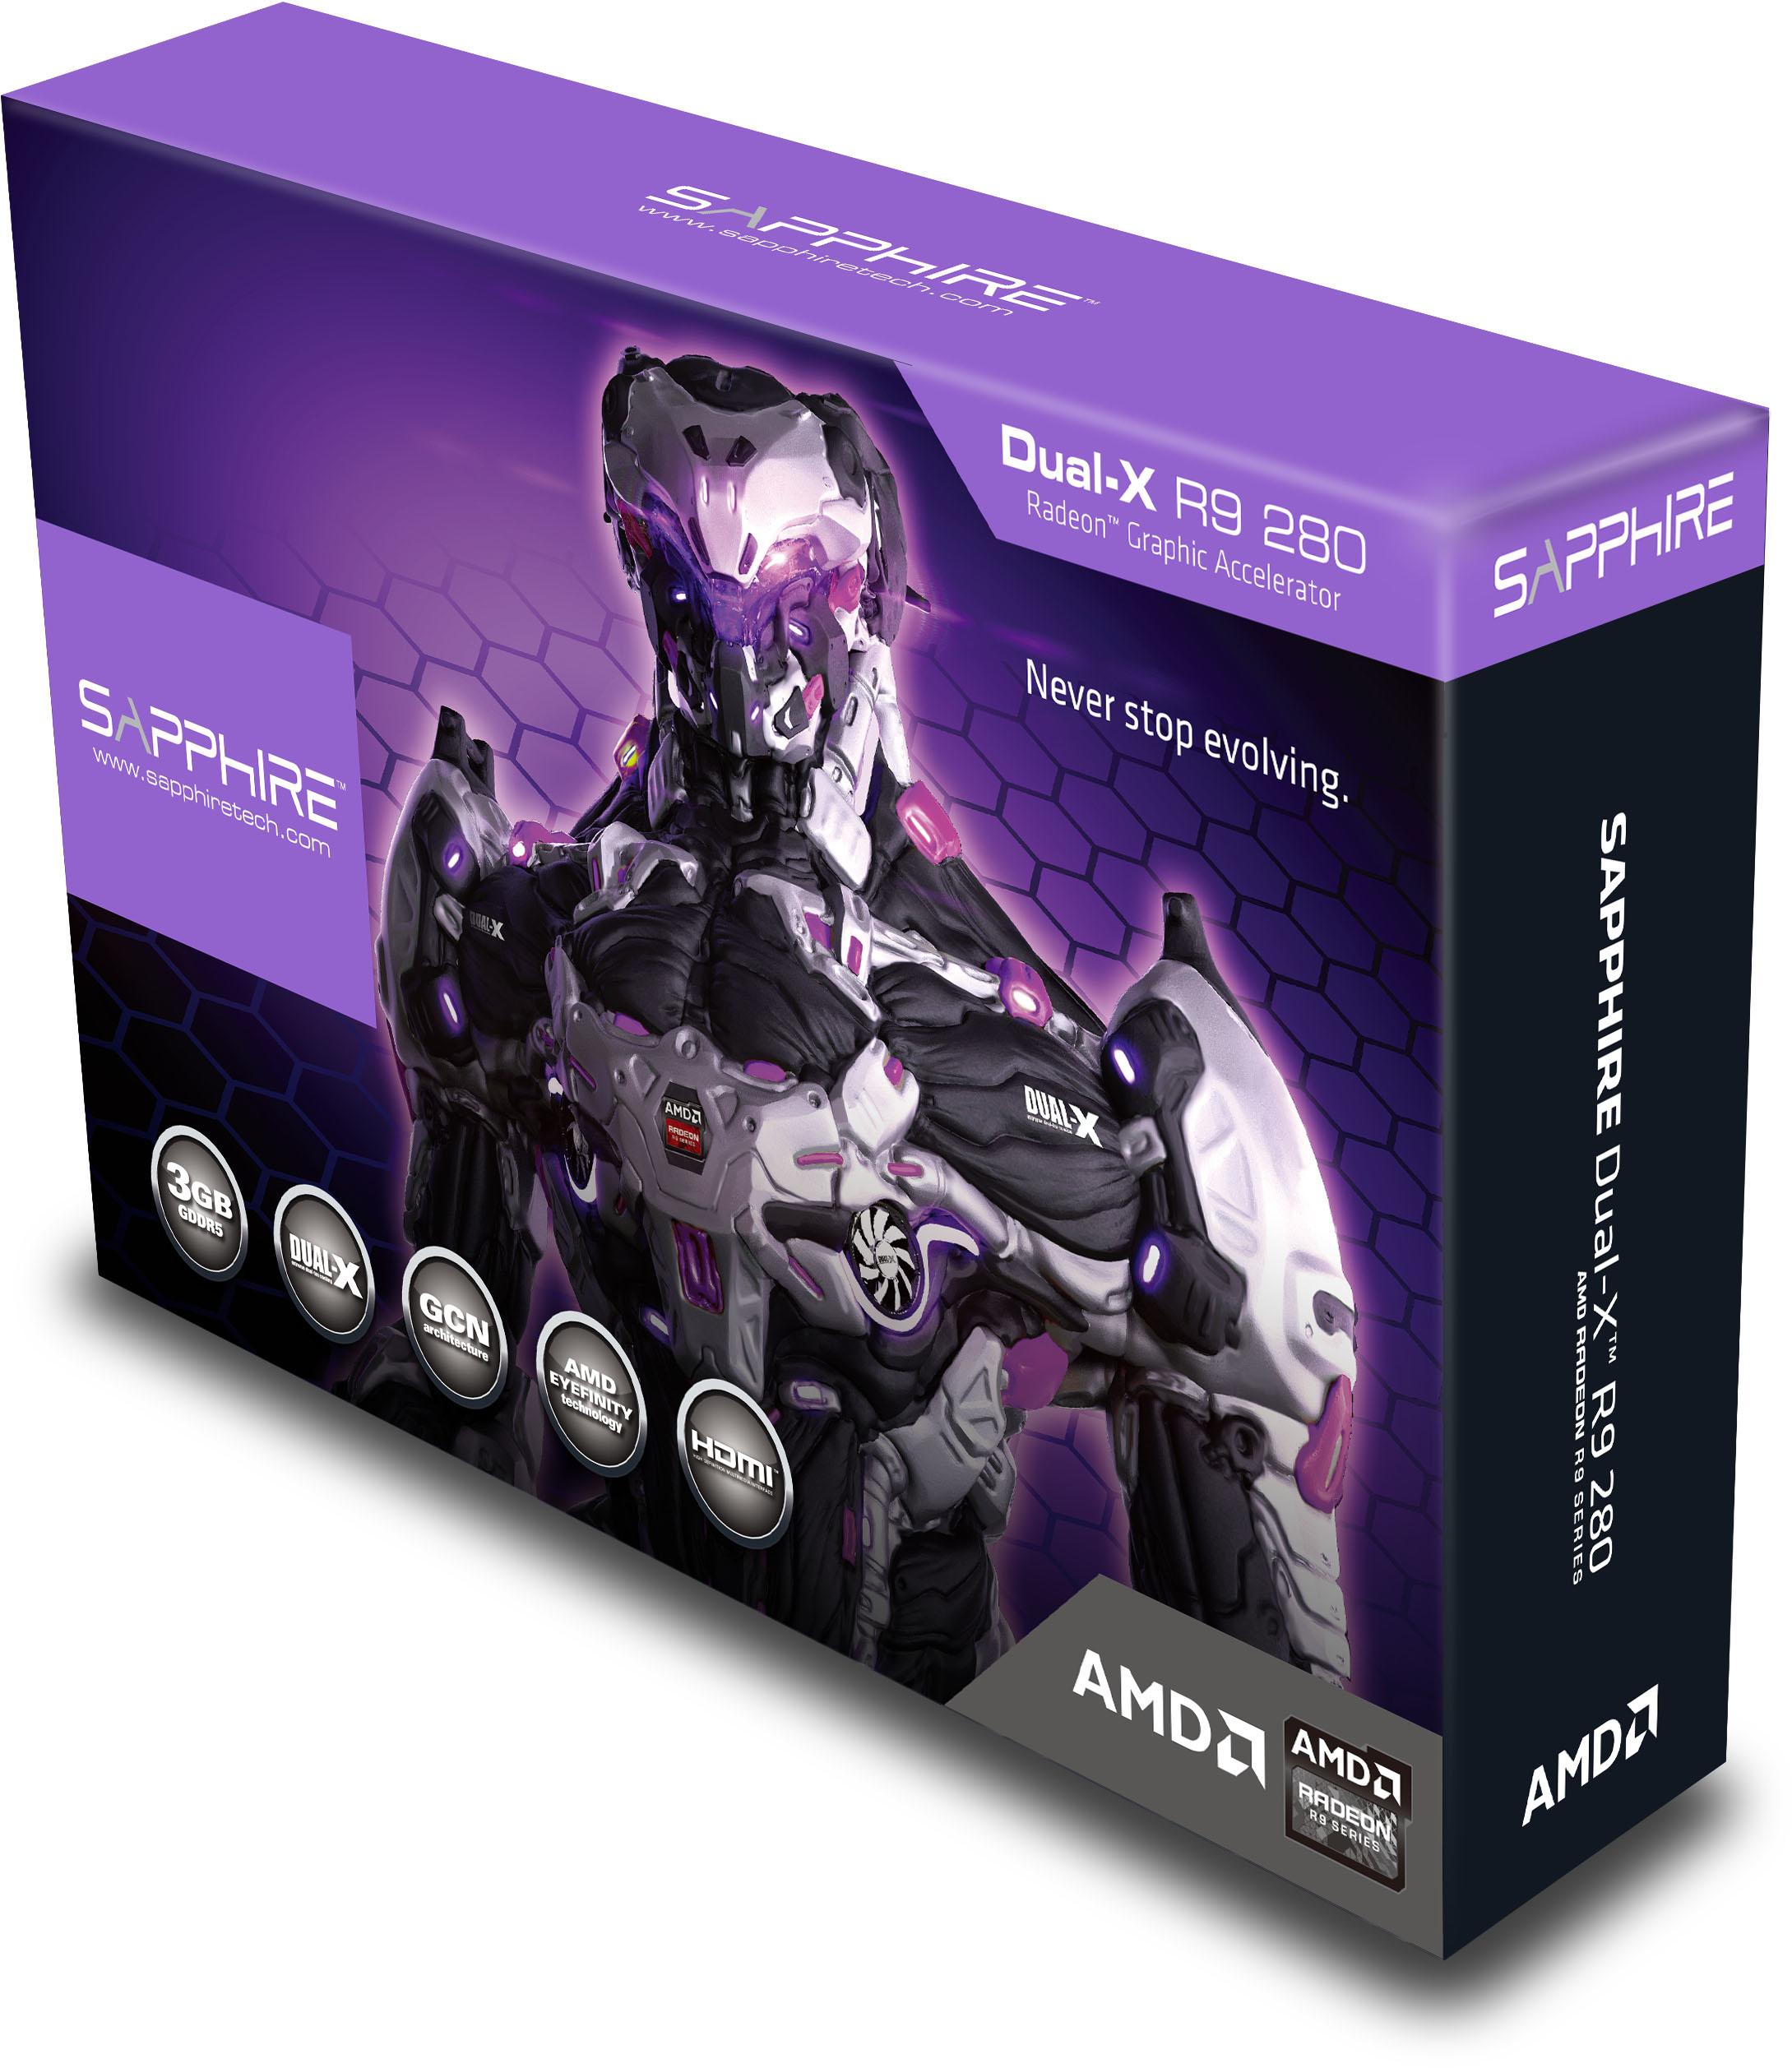 Sapphire R9 280 3GB GDDR5 OC DUAL-X with Boost